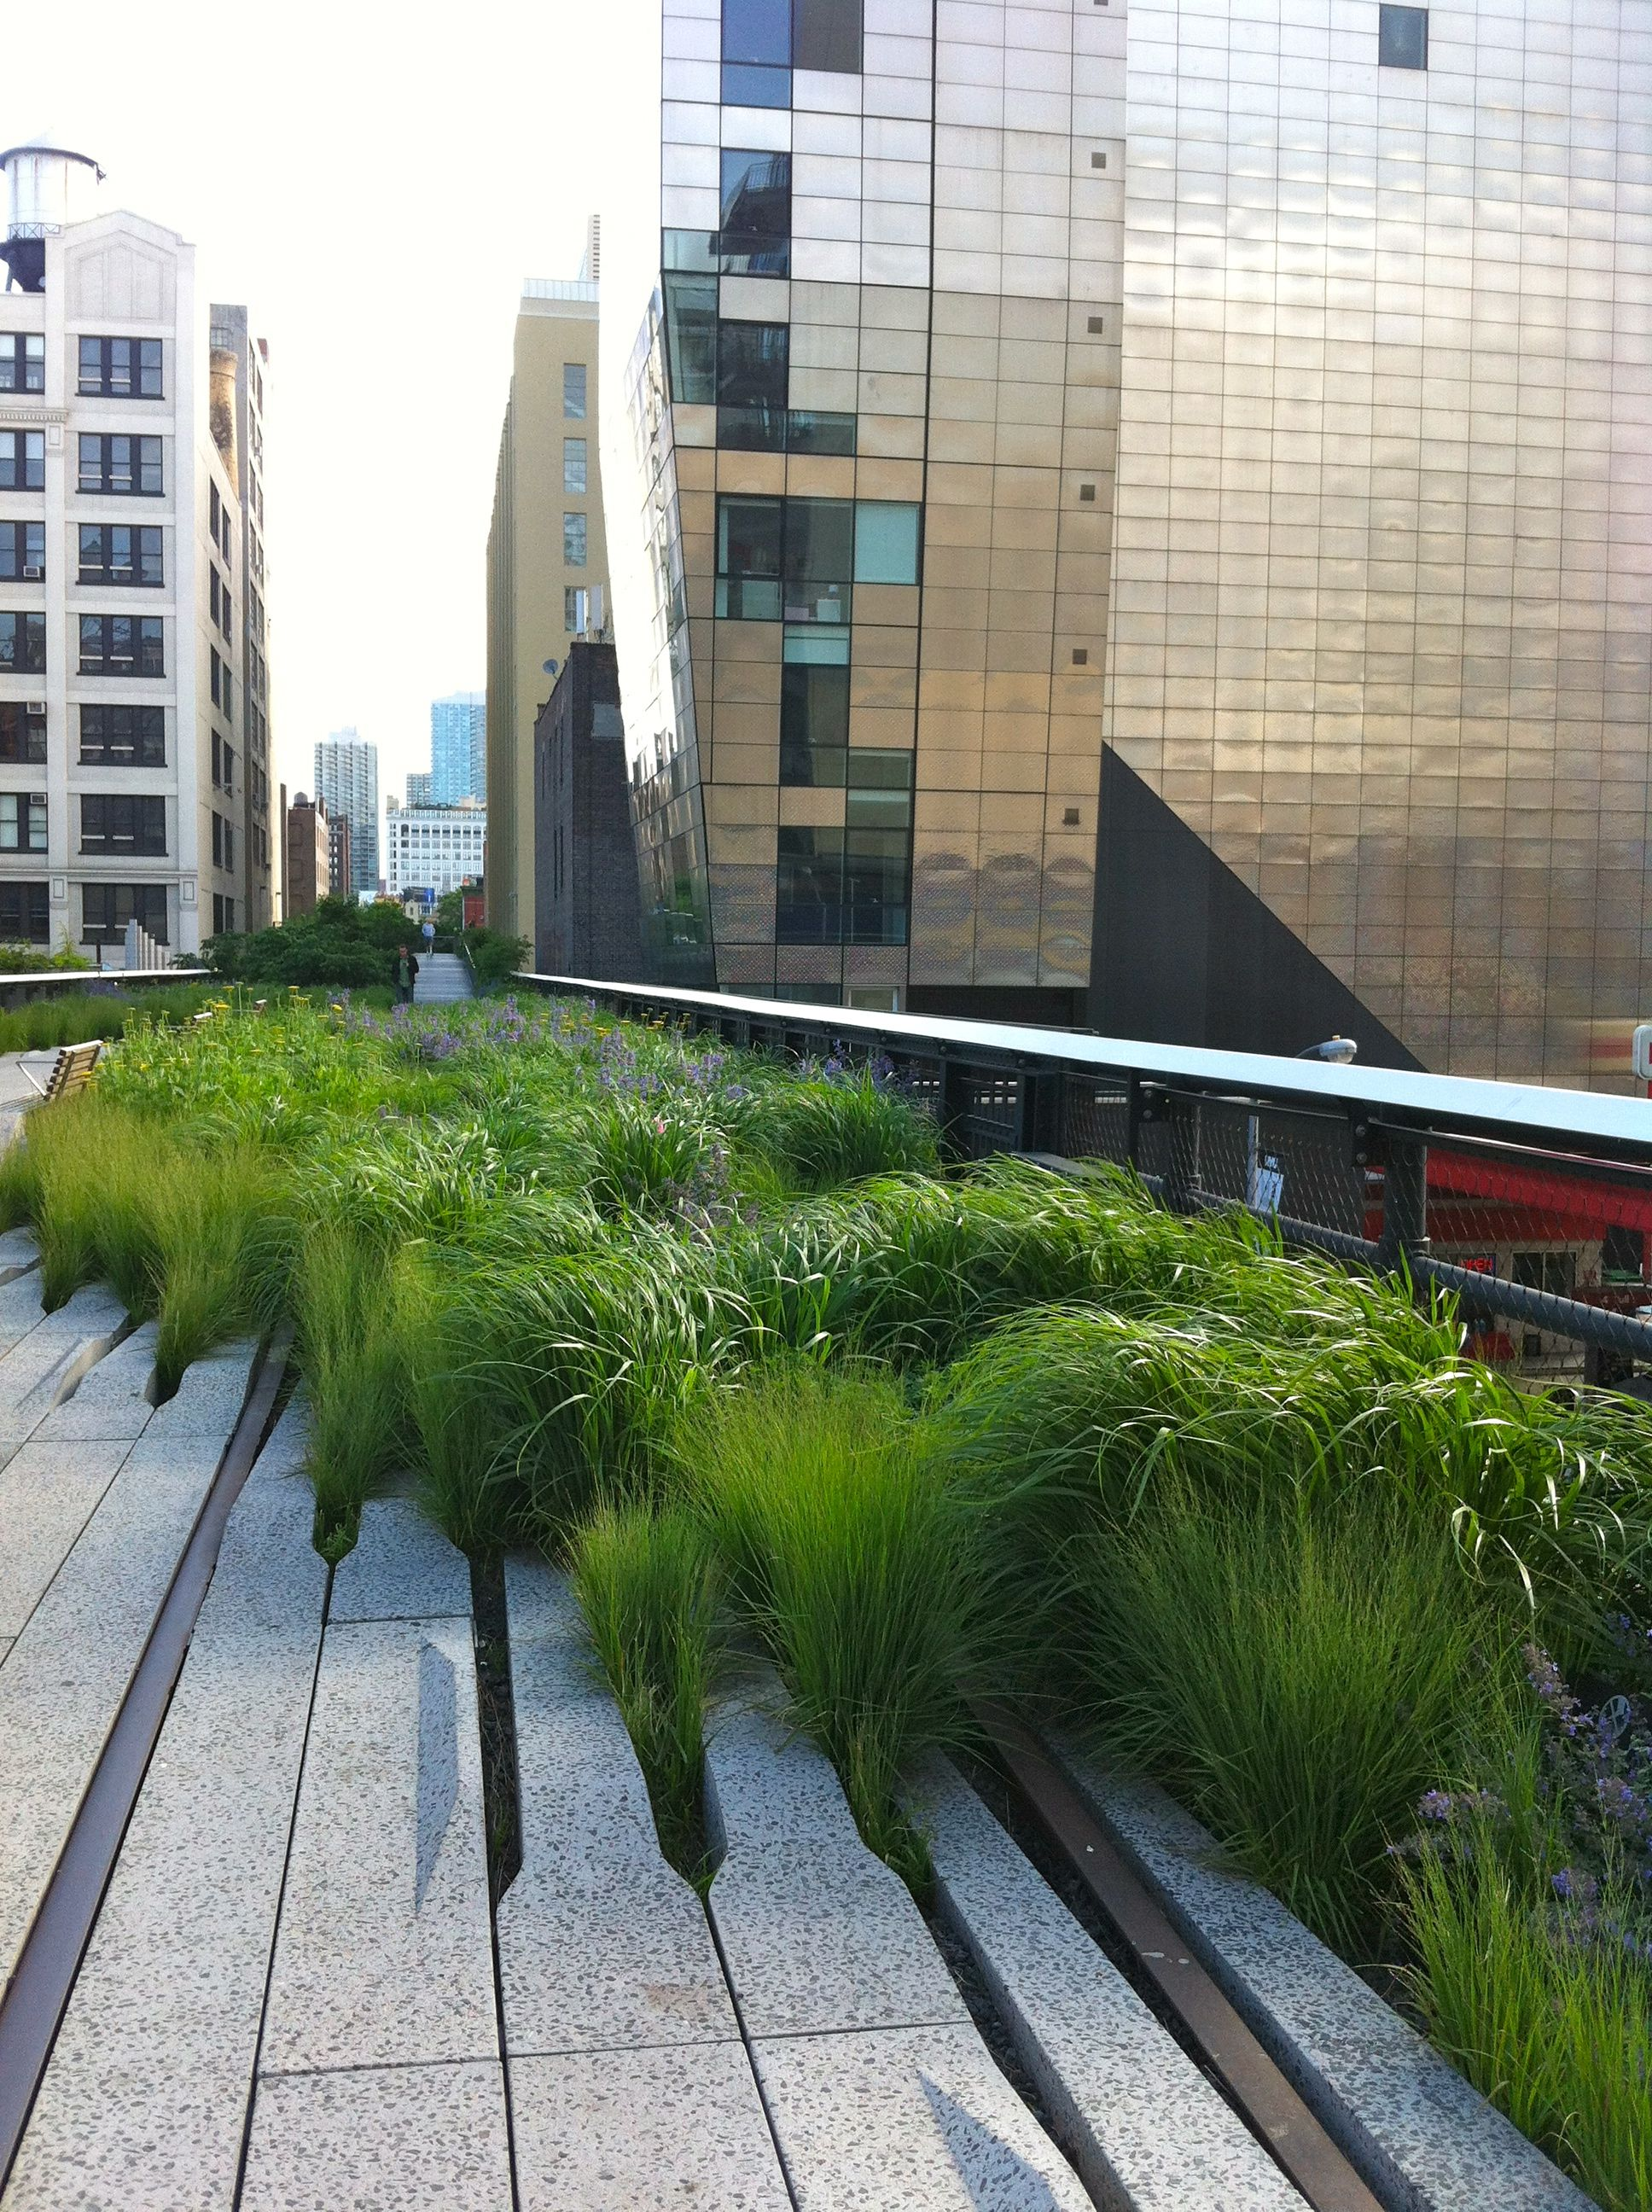 Pin By Ken Sinansky On Patio Garden Architecture Green Architecture Landscape Design